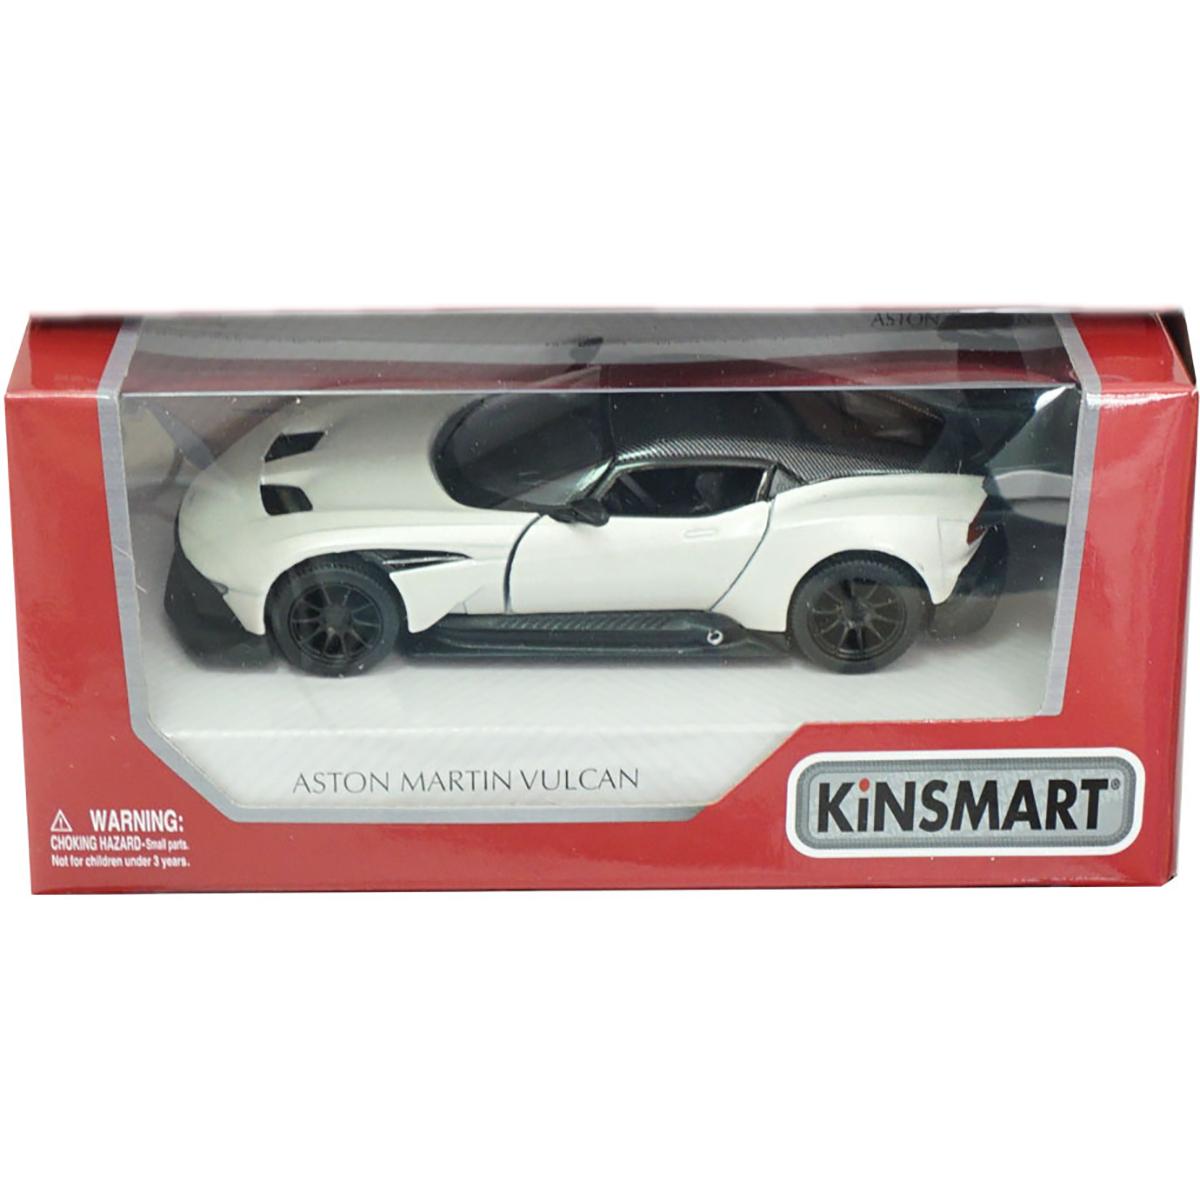 Masinuta din metal Kinsmart, Aston Martin Vulcan, Alb